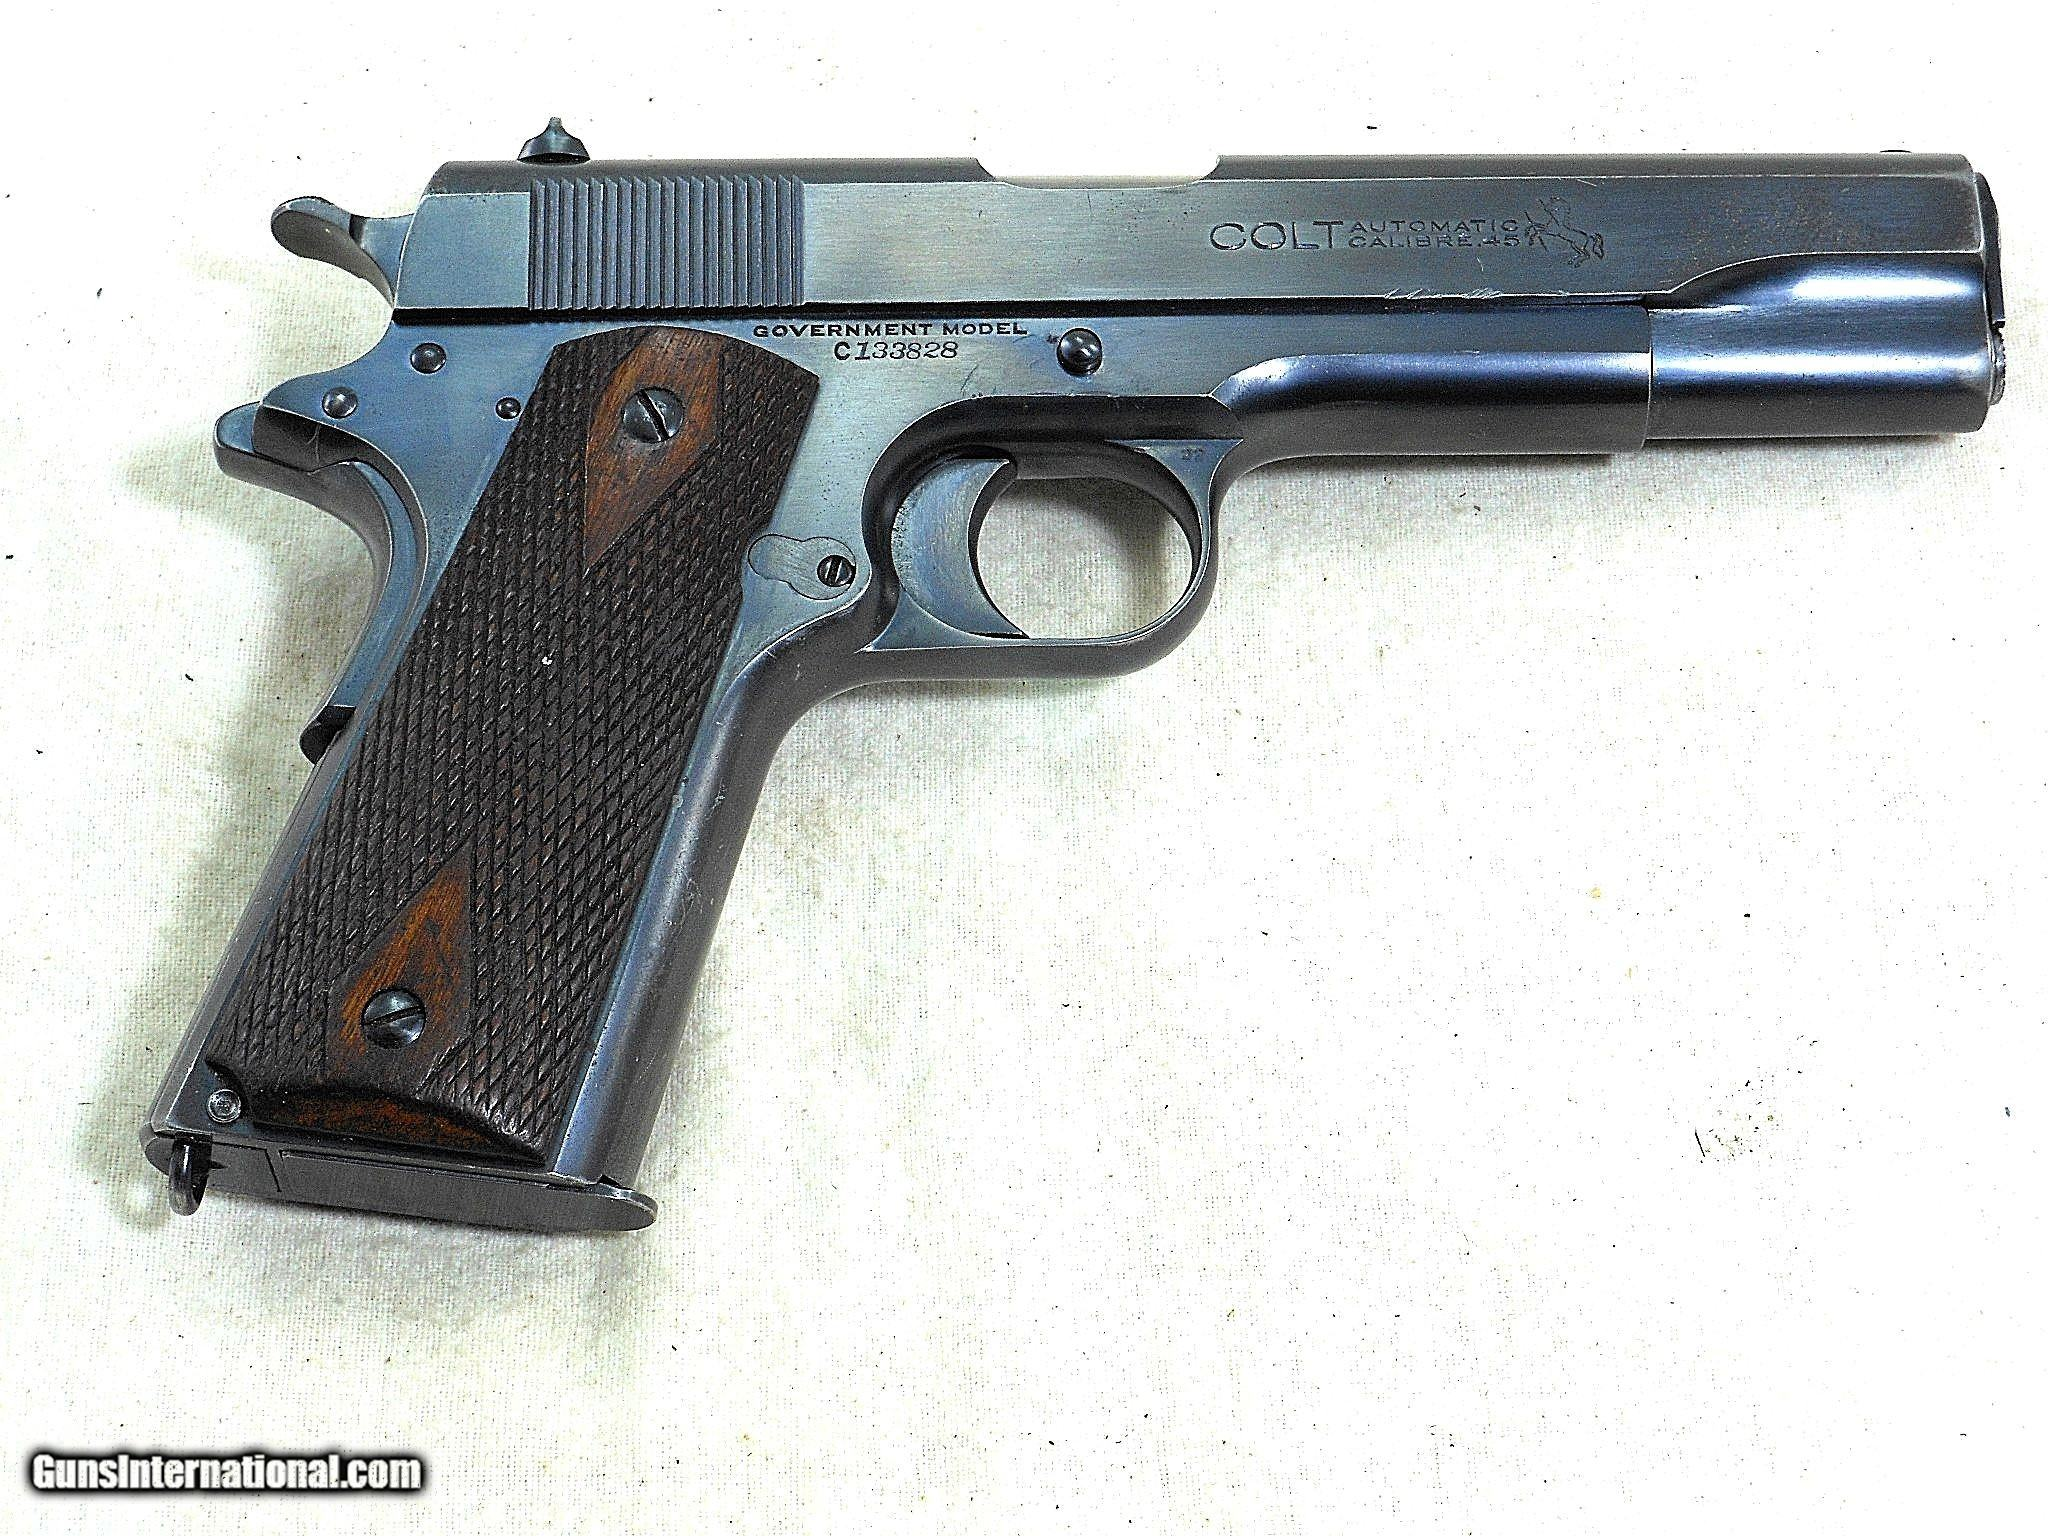 Colt Model 1911 Civilian With Original Box And Accessories 1922